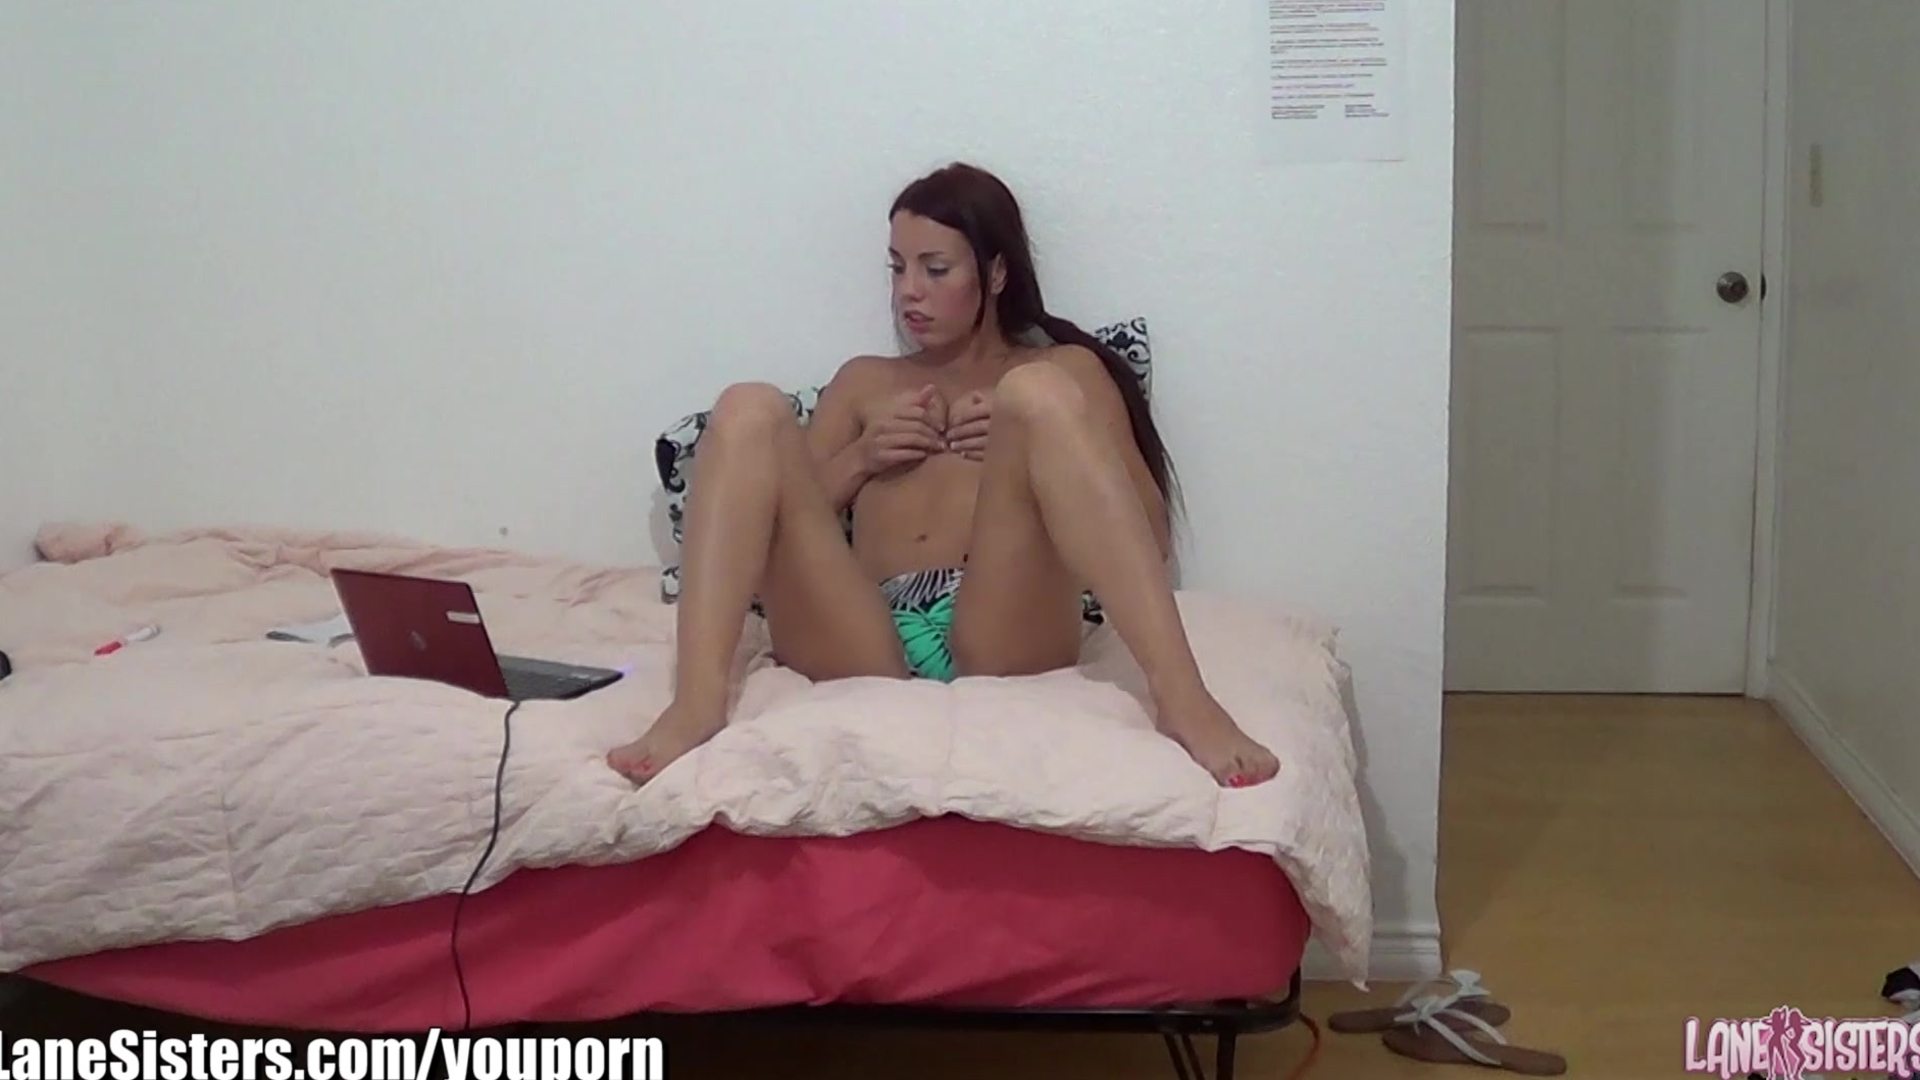 LaneSisters 18yo on hidden camera webcam dating